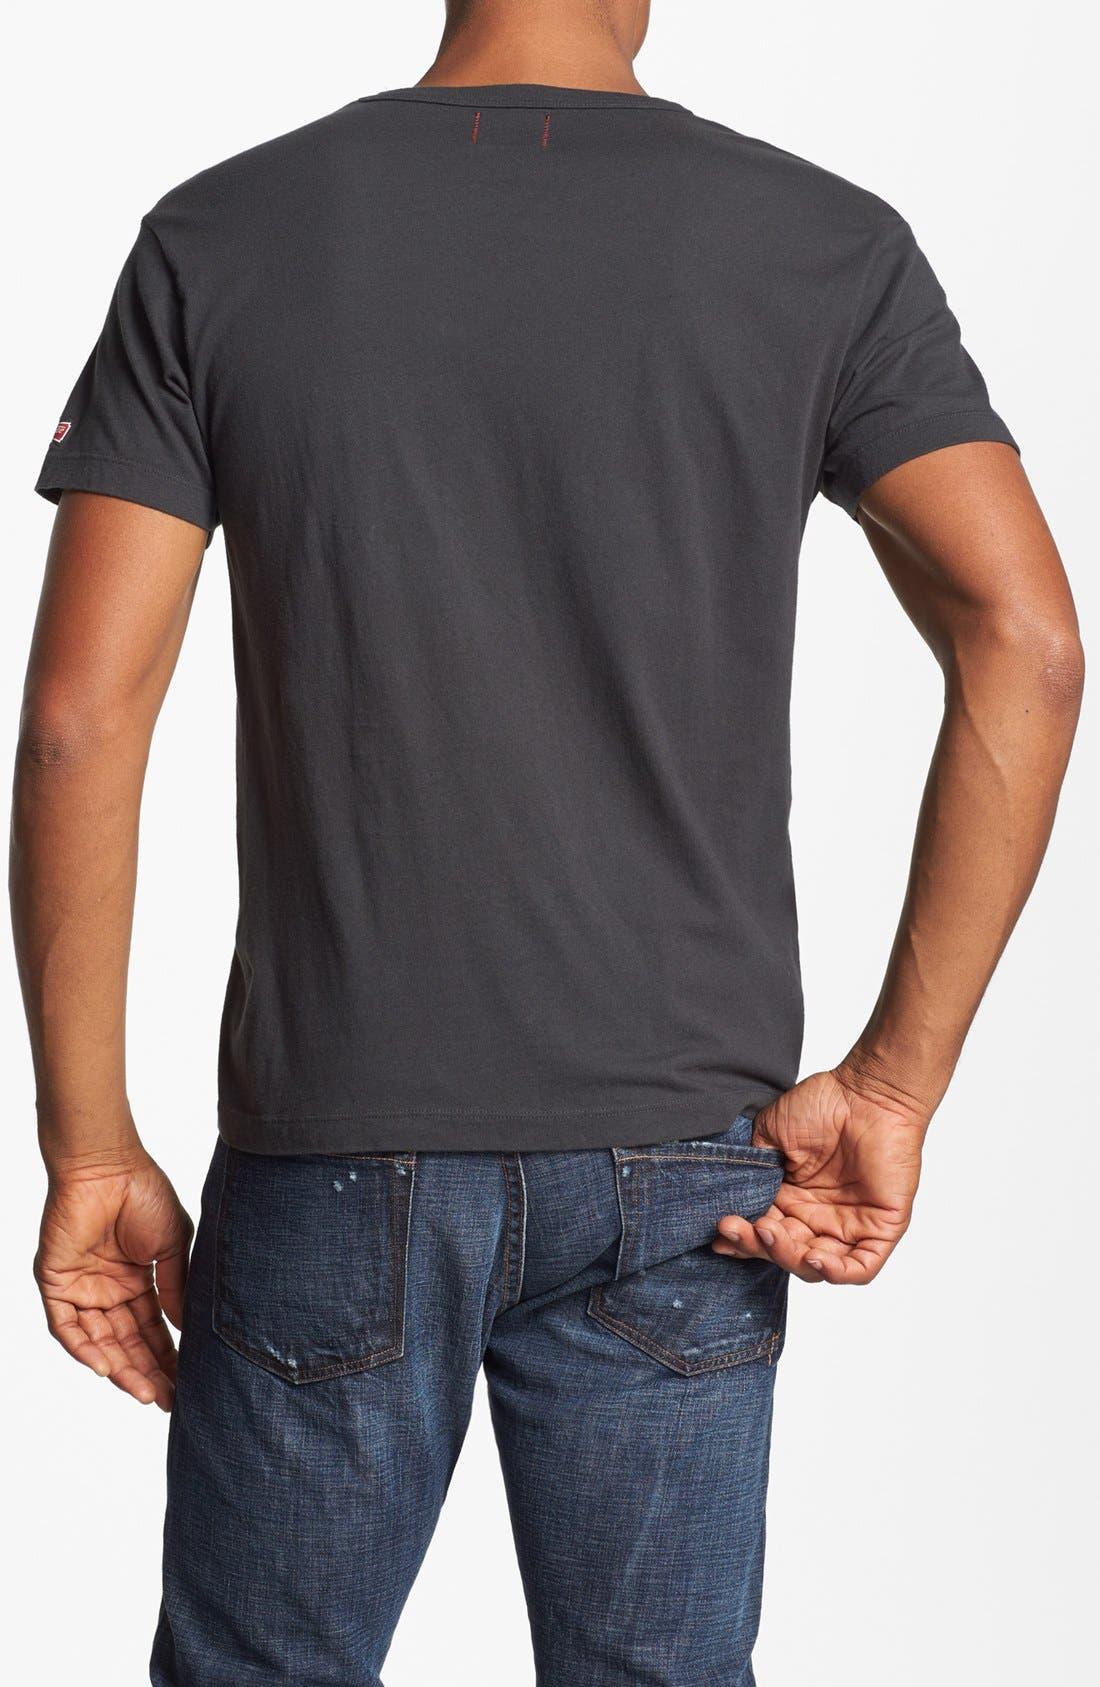 Alternate Image 2  - Tailgate 'High Life Lounge' Trim Fit T-Shirt